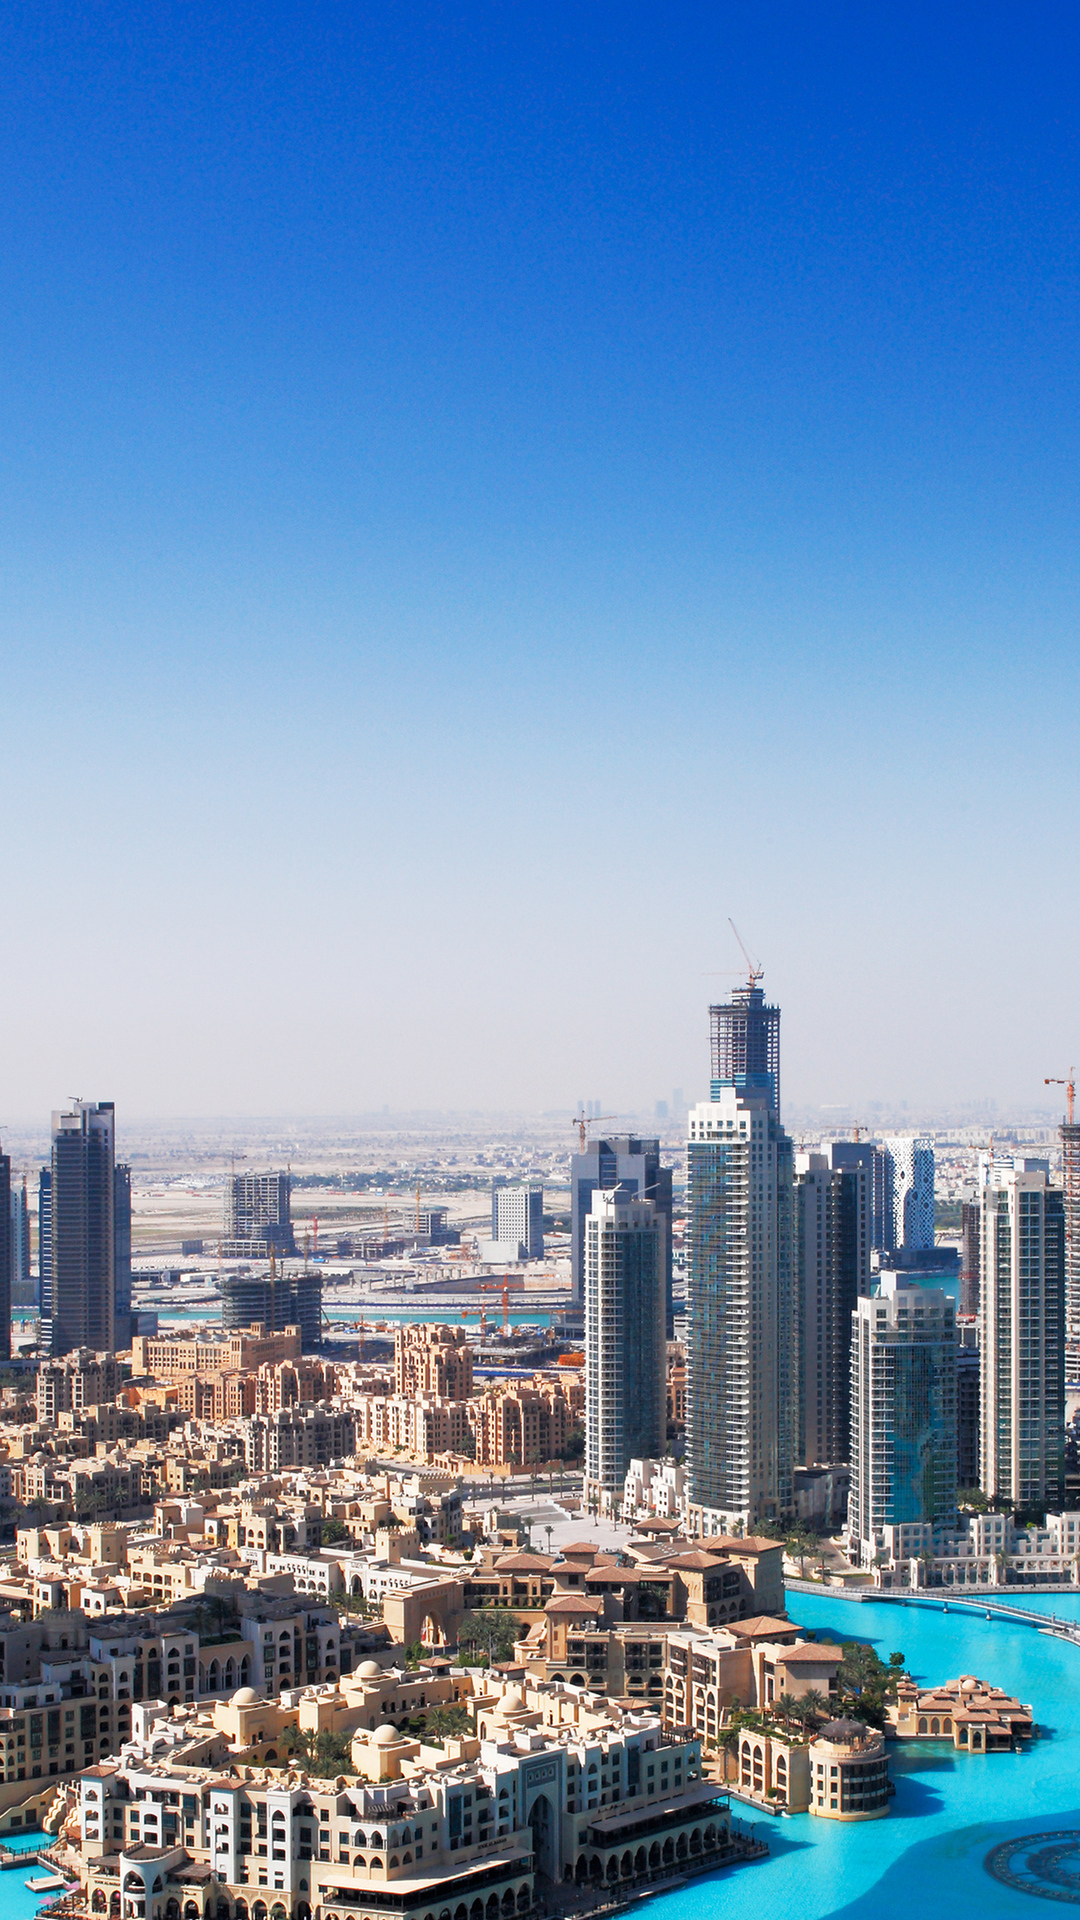 Free Download Dubai Skyline 4k Ultra Hd Wallpaper 4k